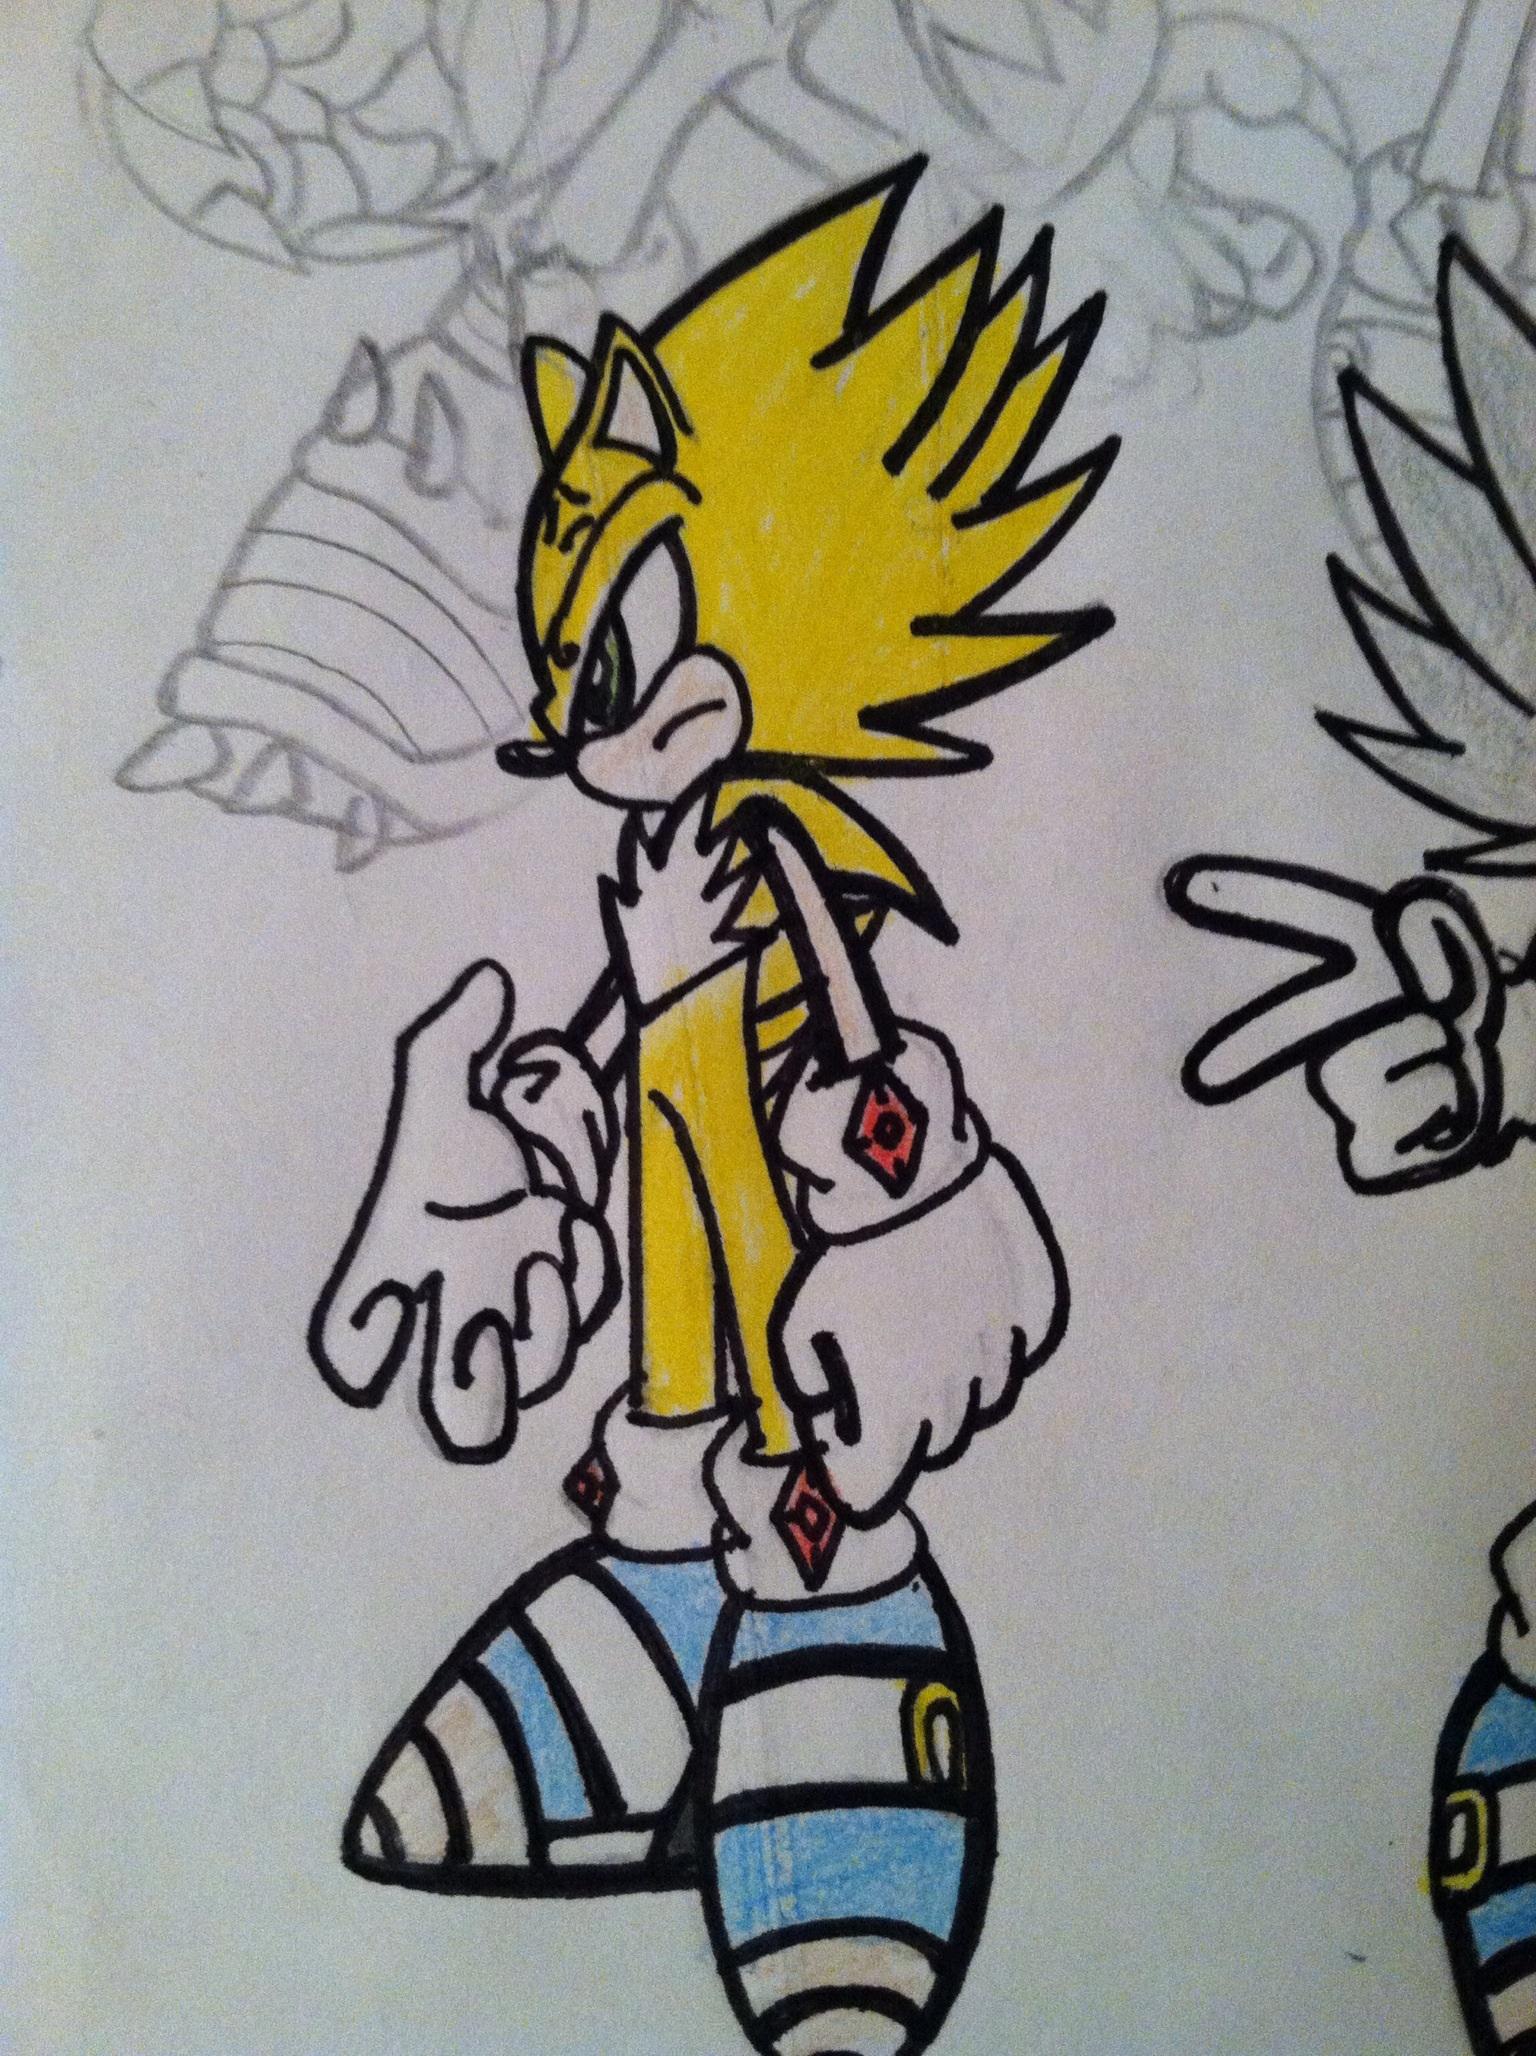 Sonic The Hedgehog Headshot Majin Sojy The Hedgeho...